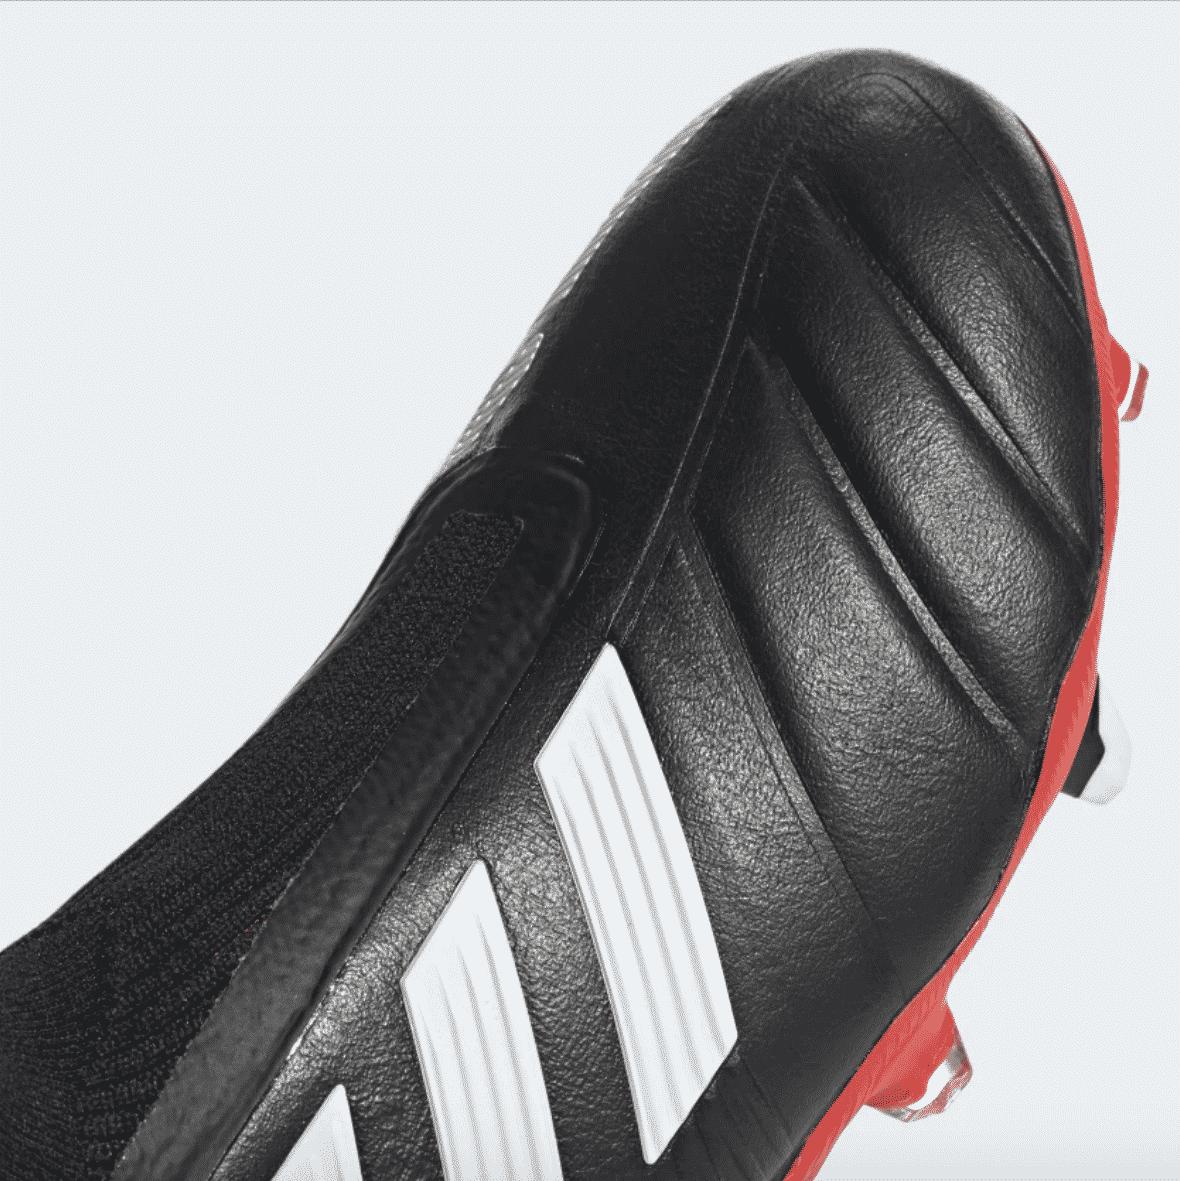 adidas-predator-19+-reedition-predator-mania-noir-8